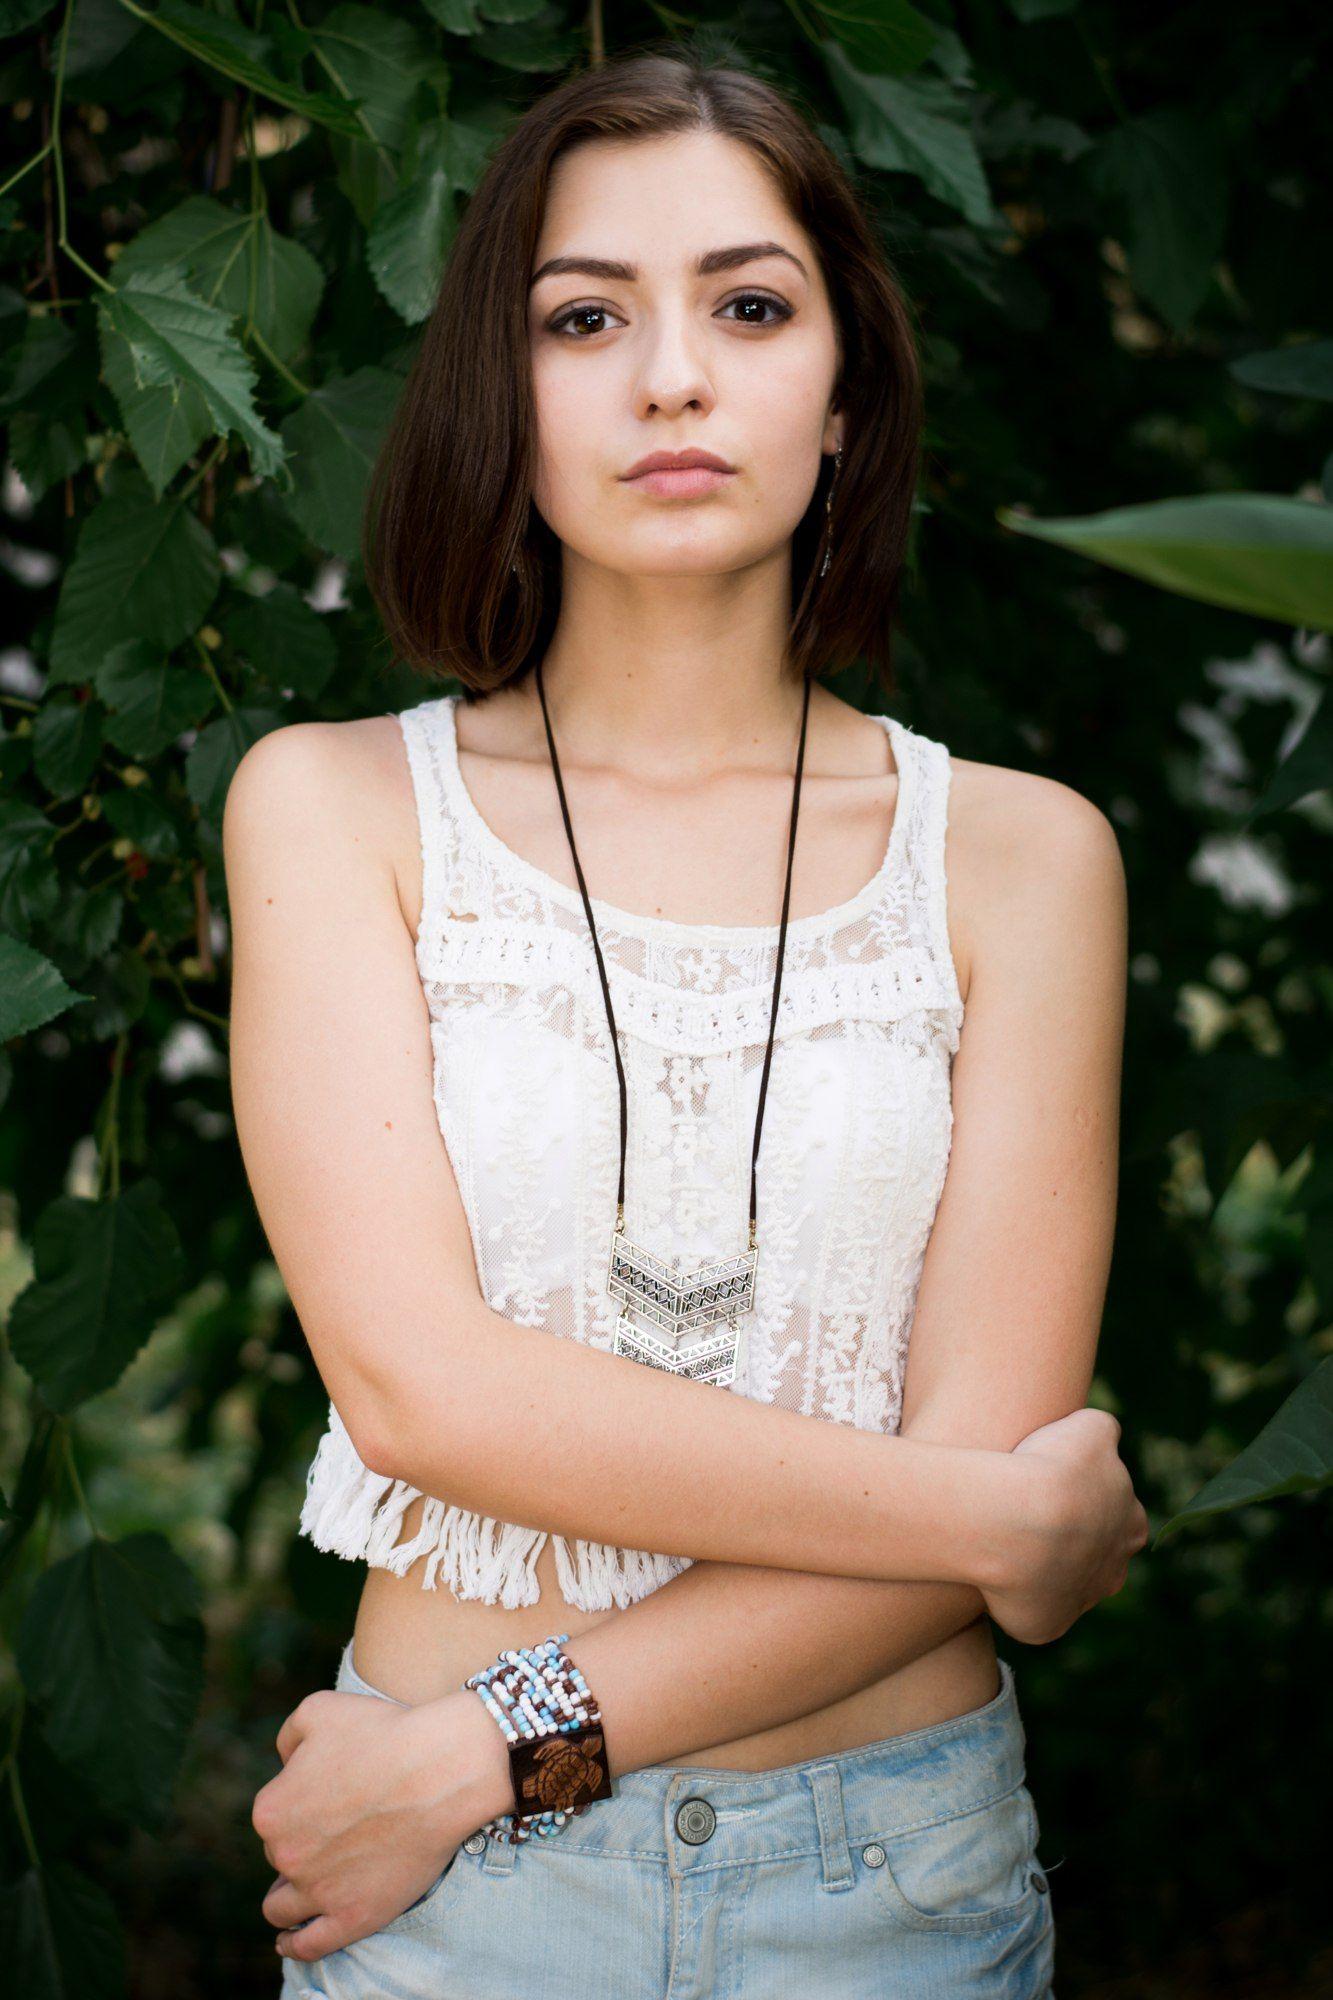 портрет, глаза, взгляд, девушка, лето, nikon d7100, 50mm 1.8g, Гозун Радослав